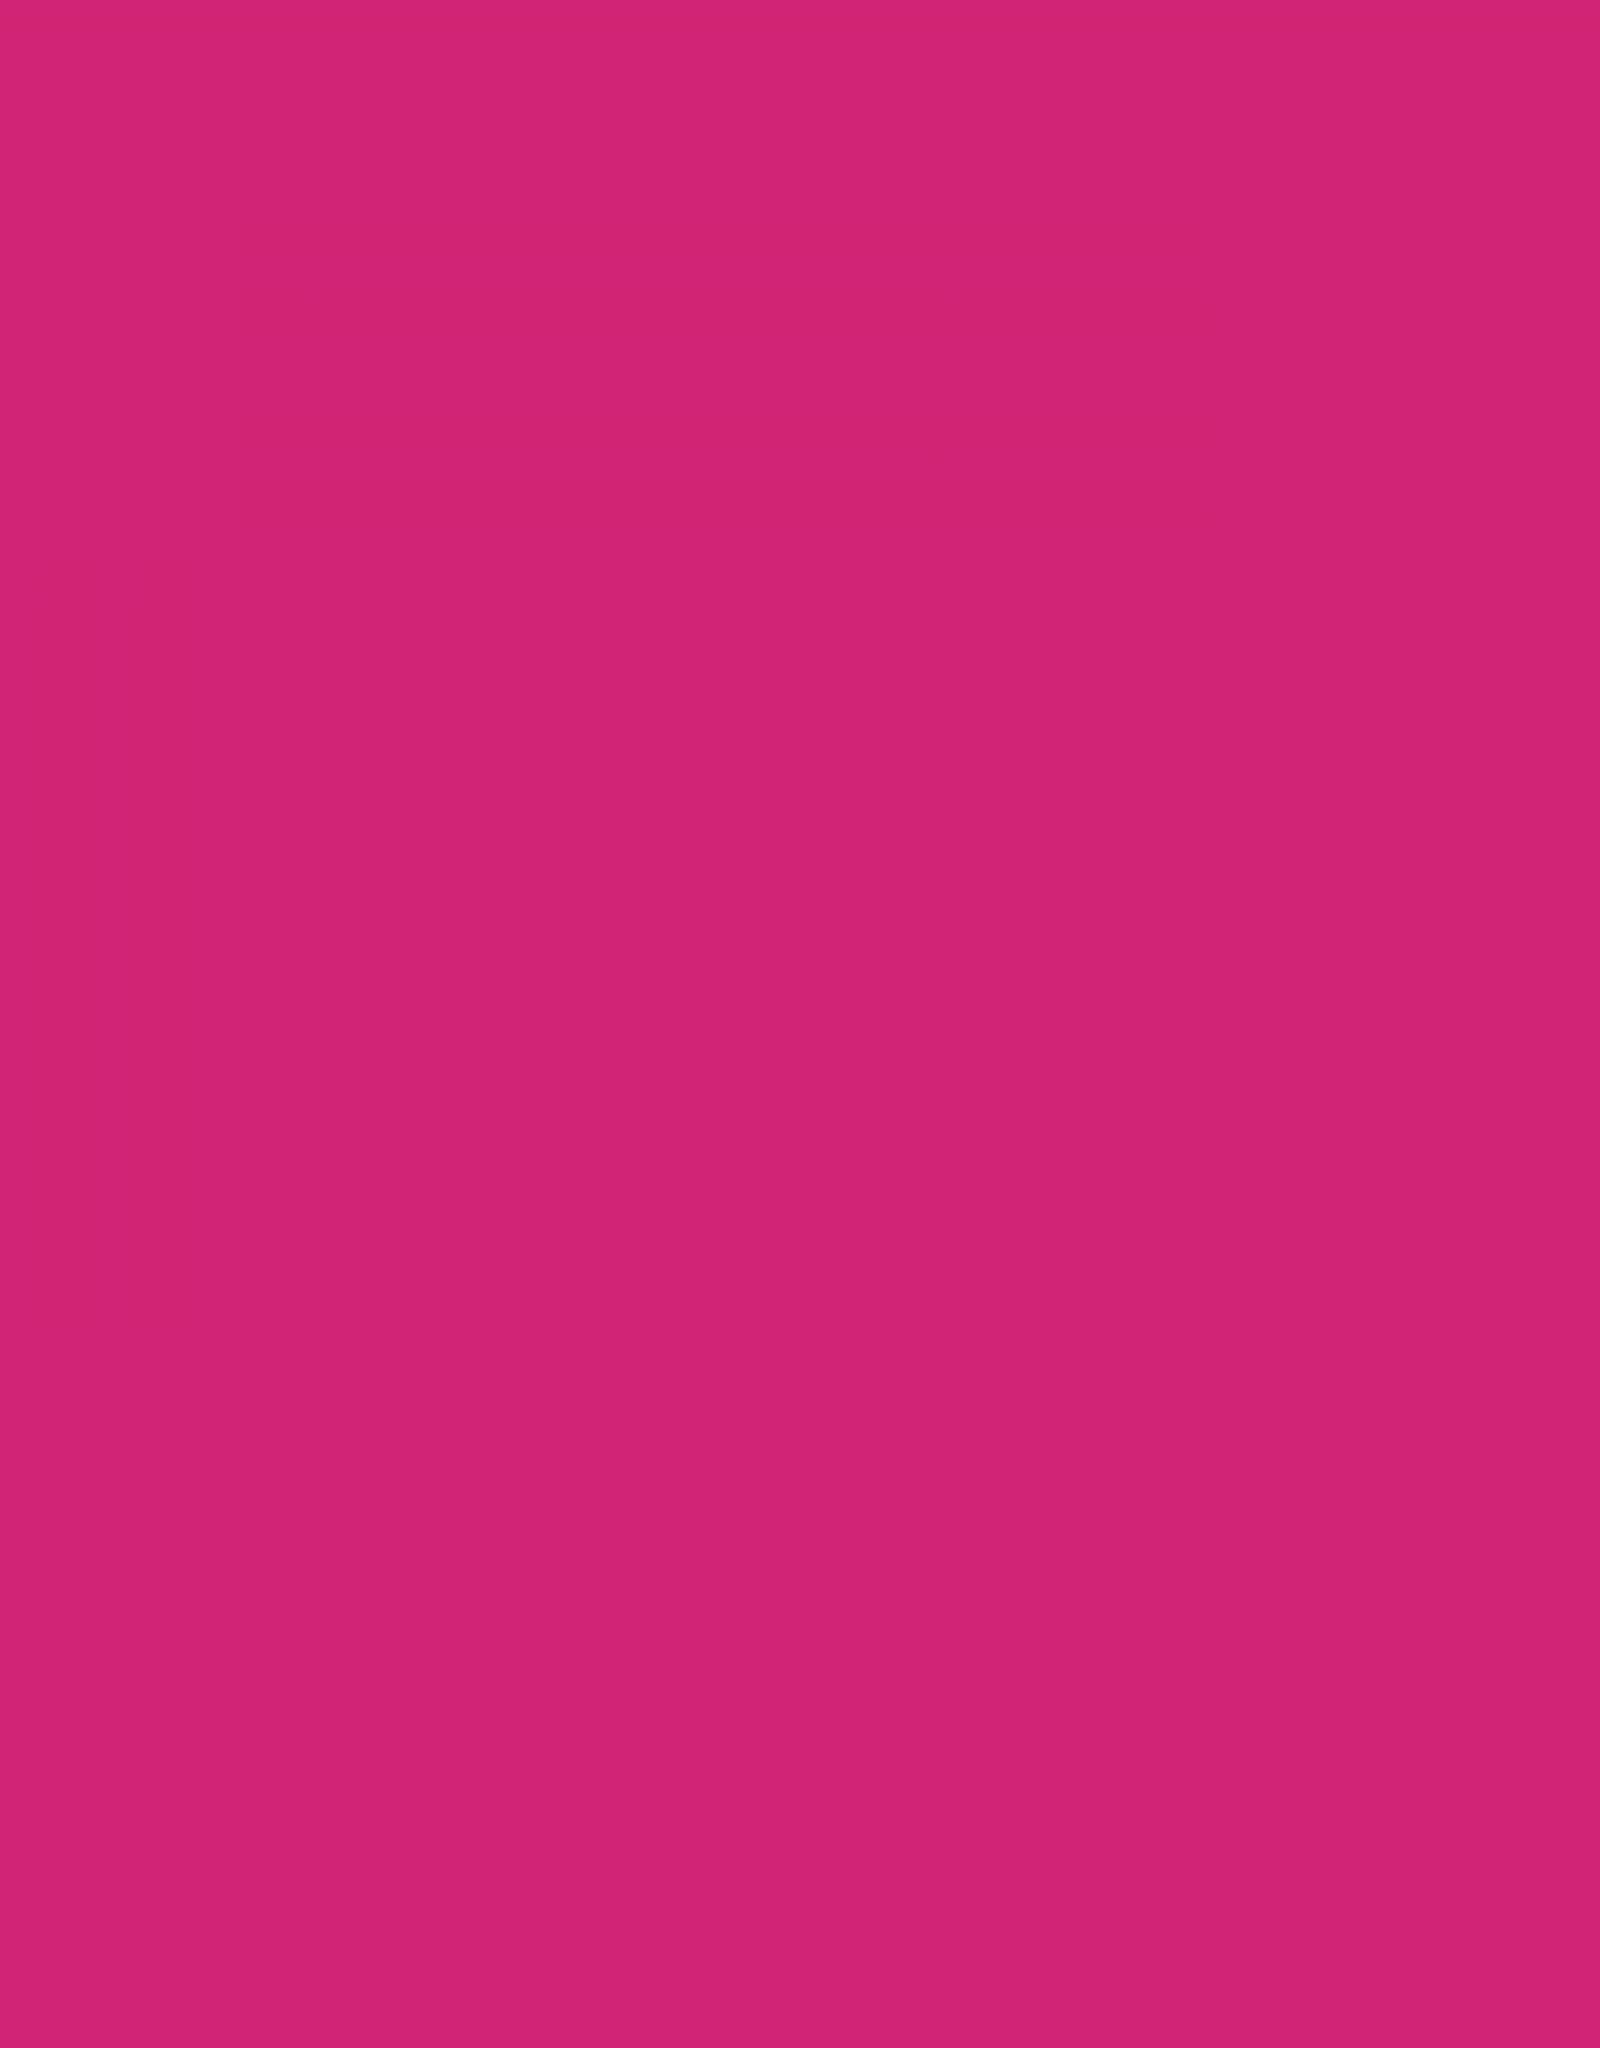 Paspel Elastisch - Fuchsia